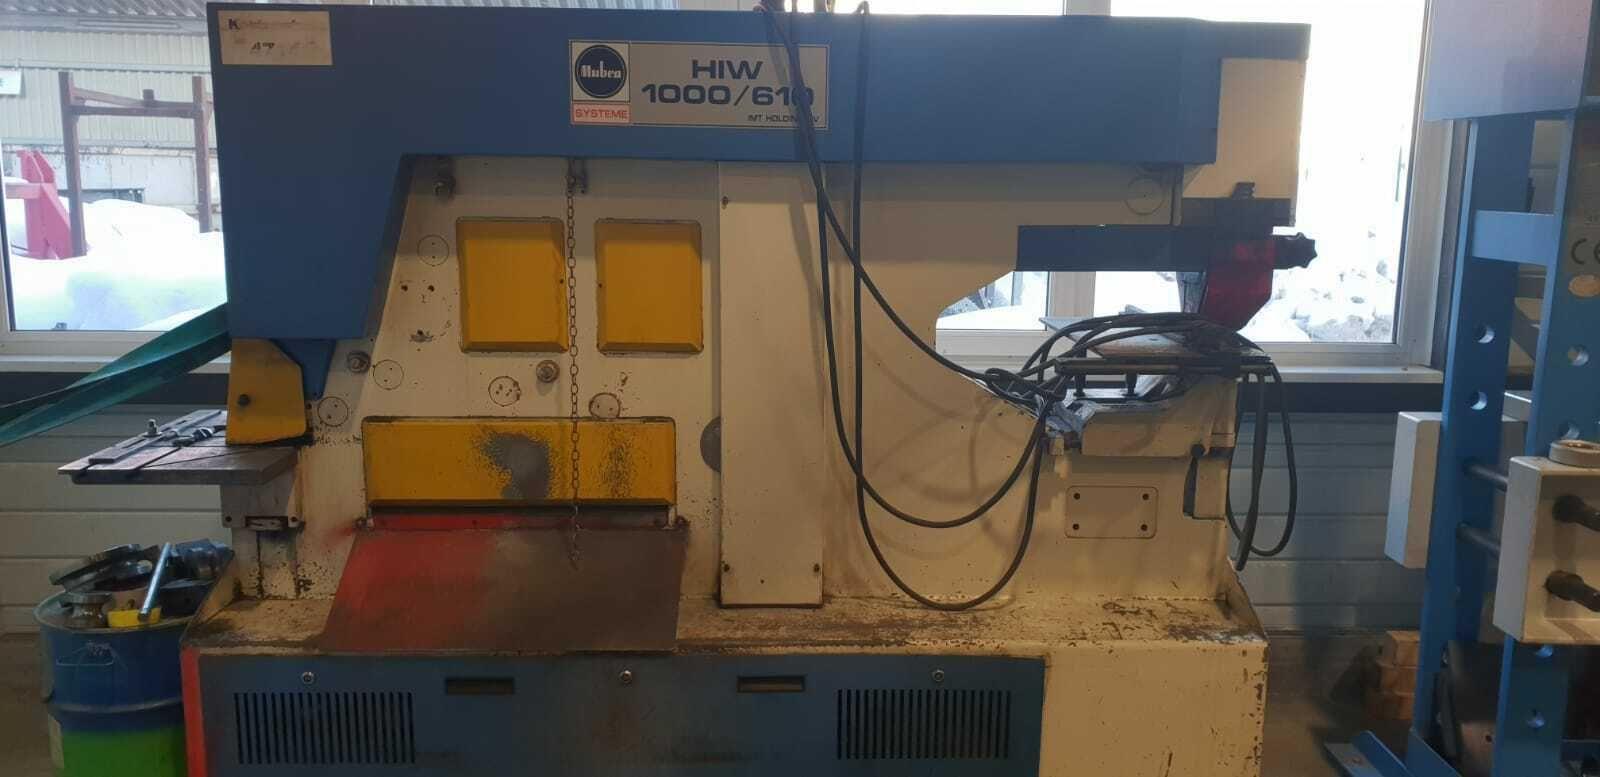 MUBEA HIW 1000/610 (PEDDINGHAUS) Profilstahlschere